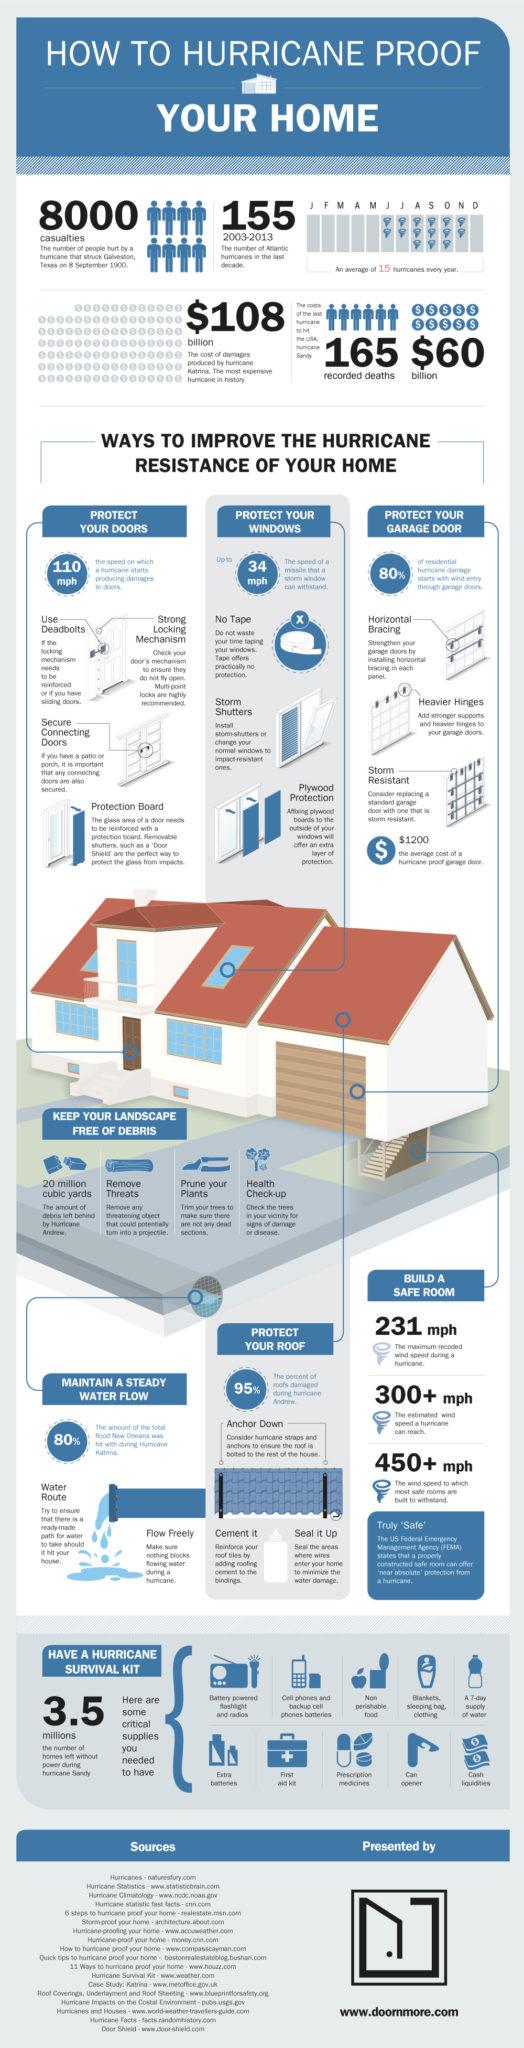 bulldog adjusters, hurricane proof your home, hurricane protection, Florida insurance